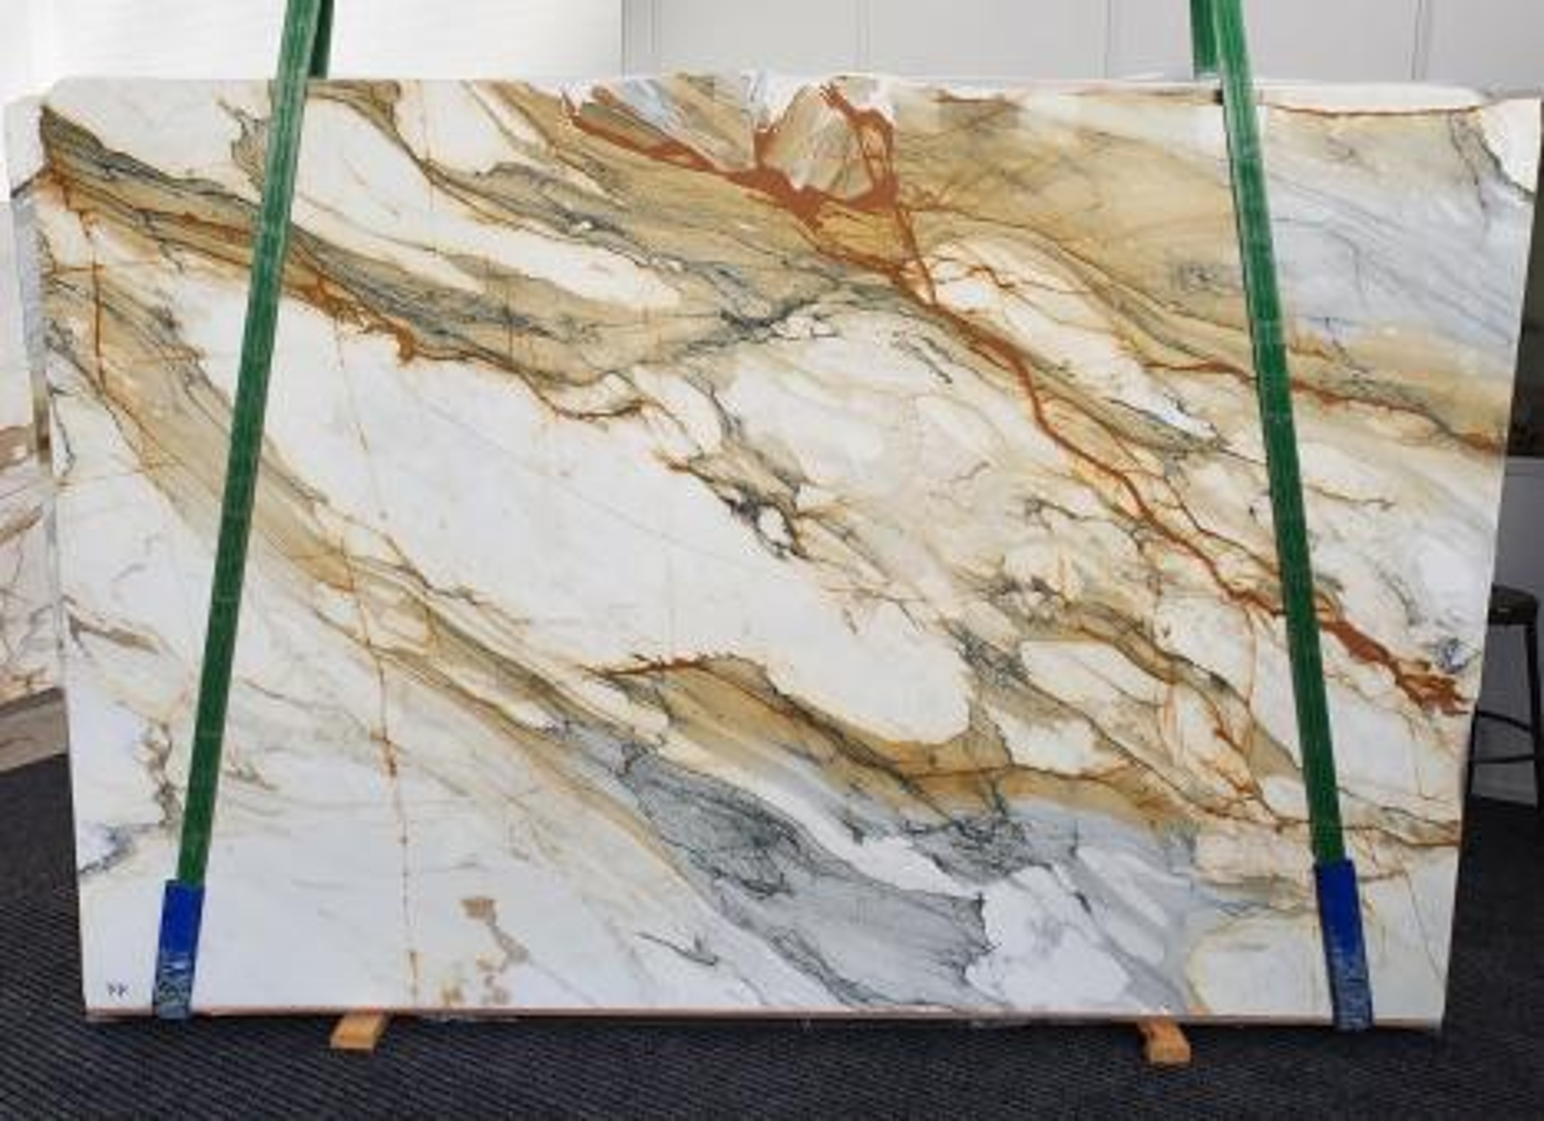 CALACATTA MACCHIAVECCHIA Suministro Veneto (Italia) de planchas pulidas en mármol natural 1422 , Slab #11